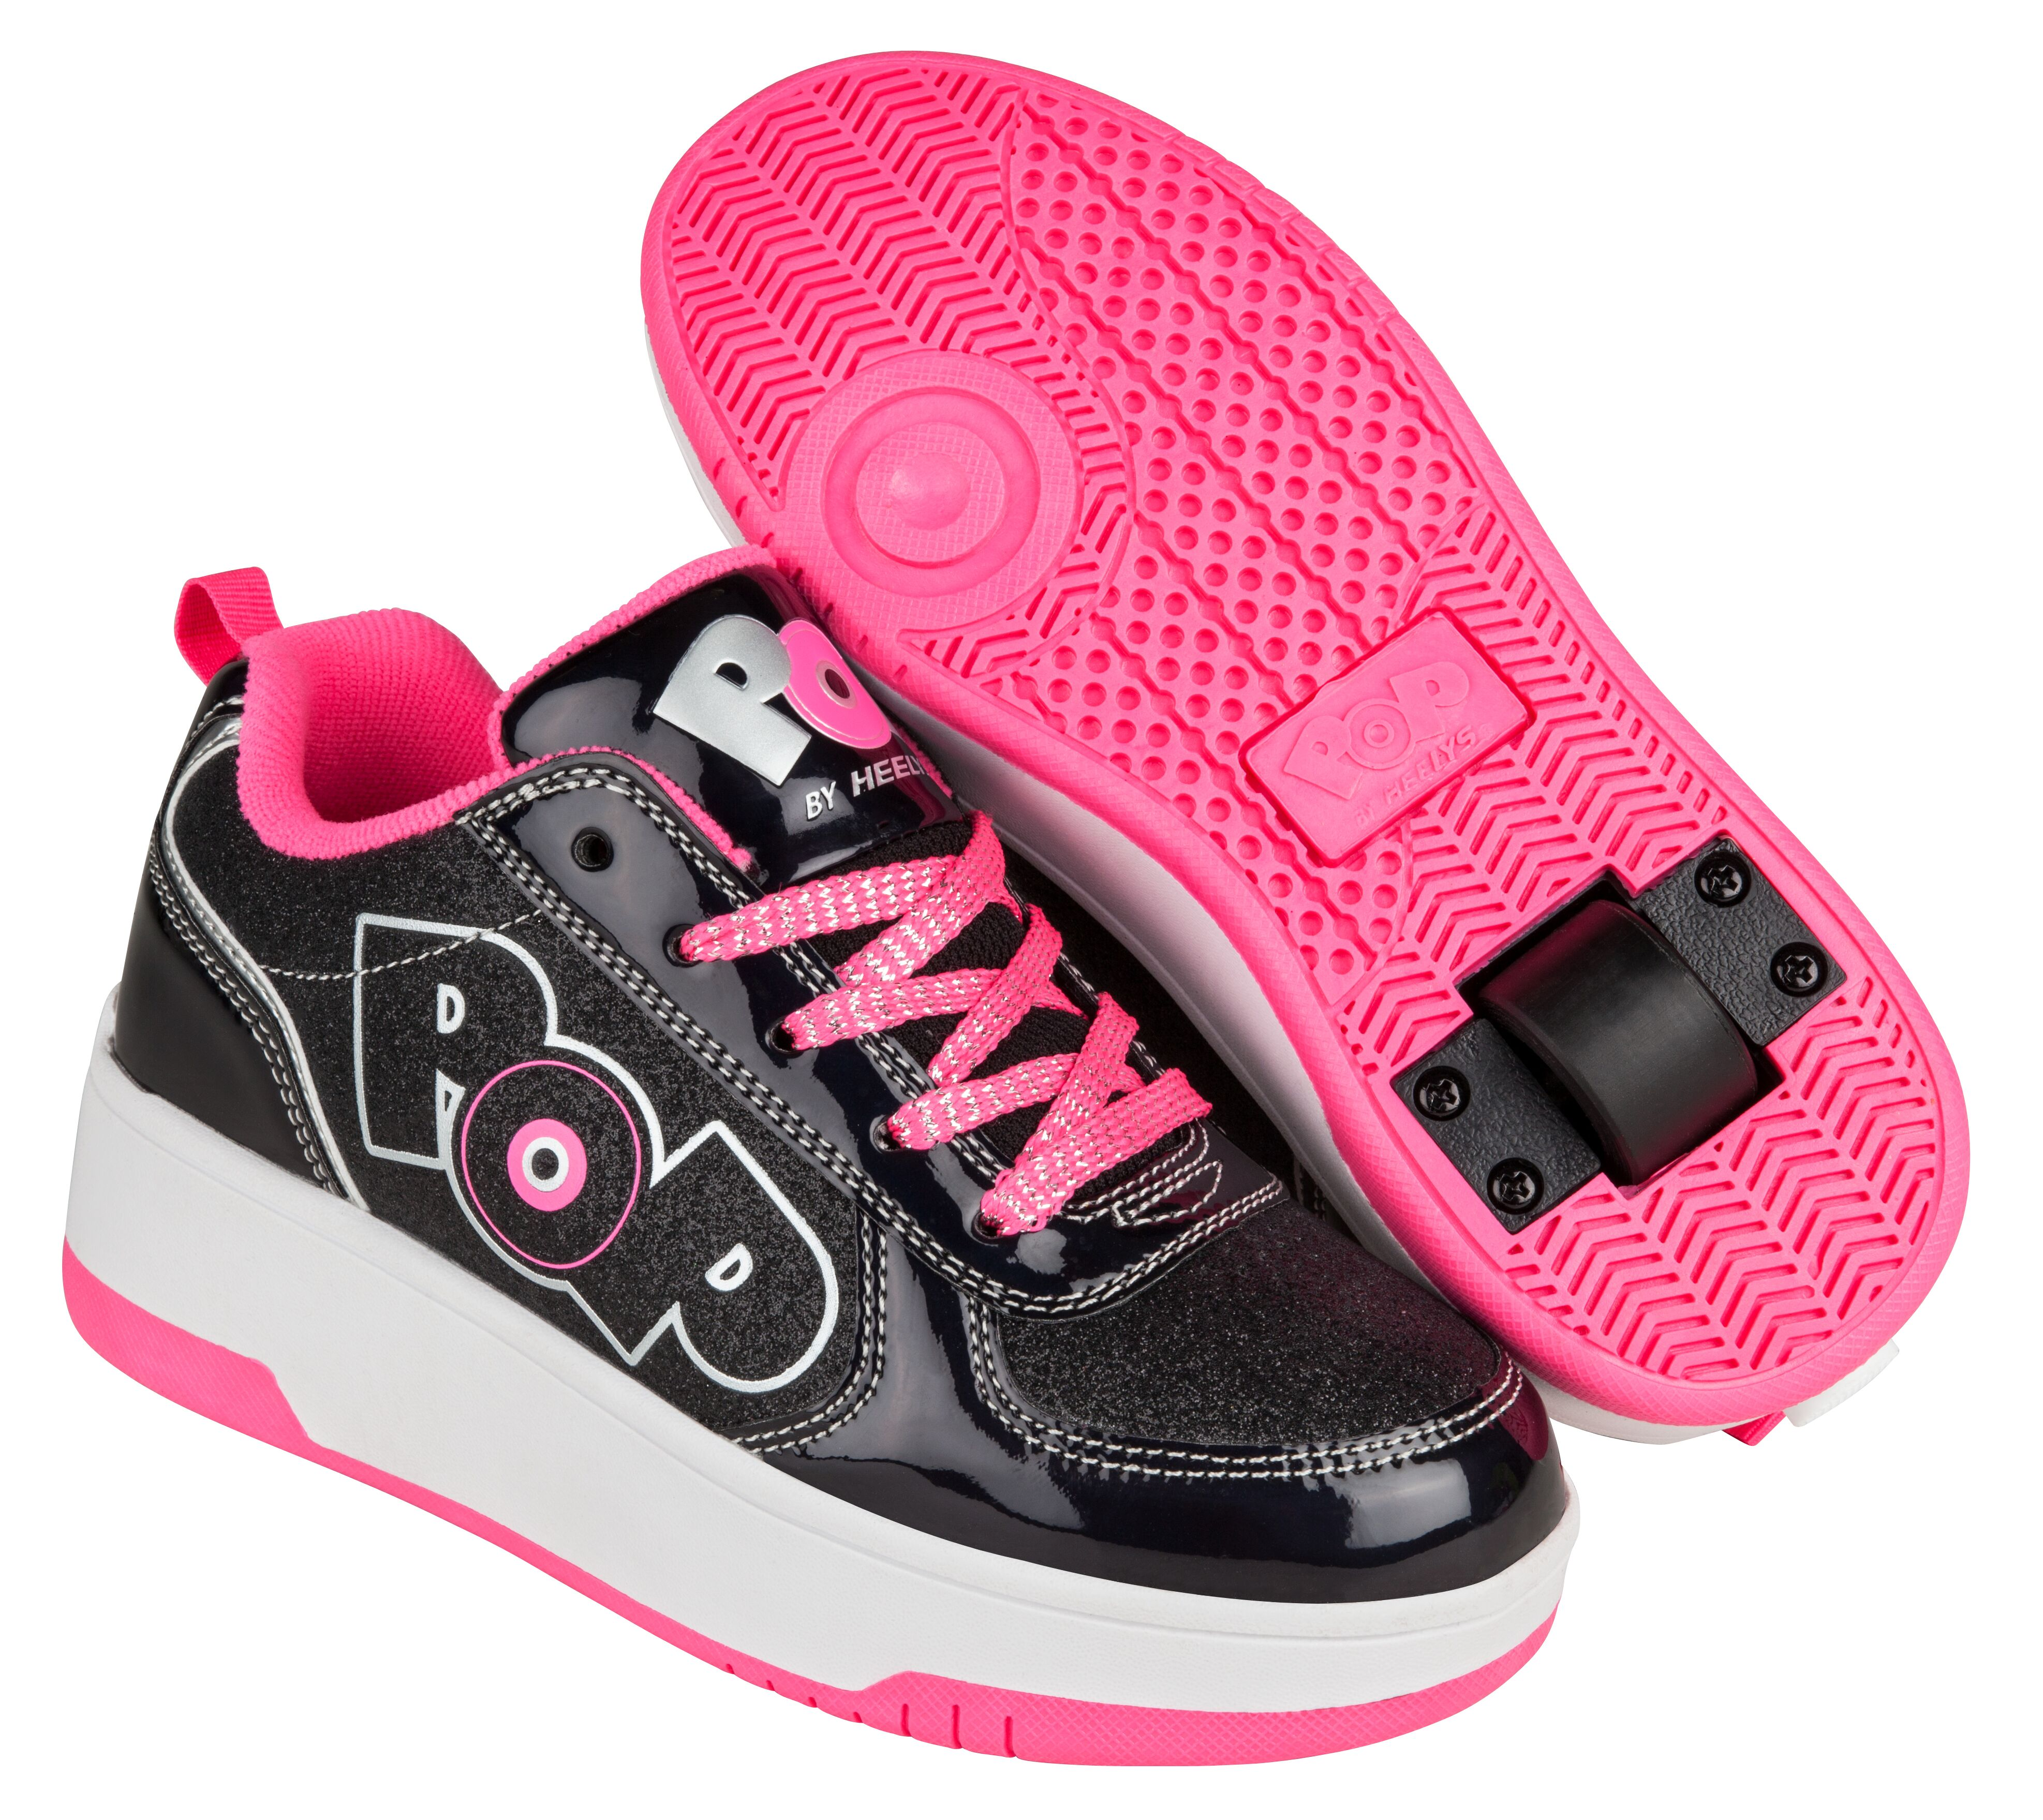 Heelys - Strike - Black Sparkle/Black Holo/Pink - Size 31 (POP-G1W-0034)